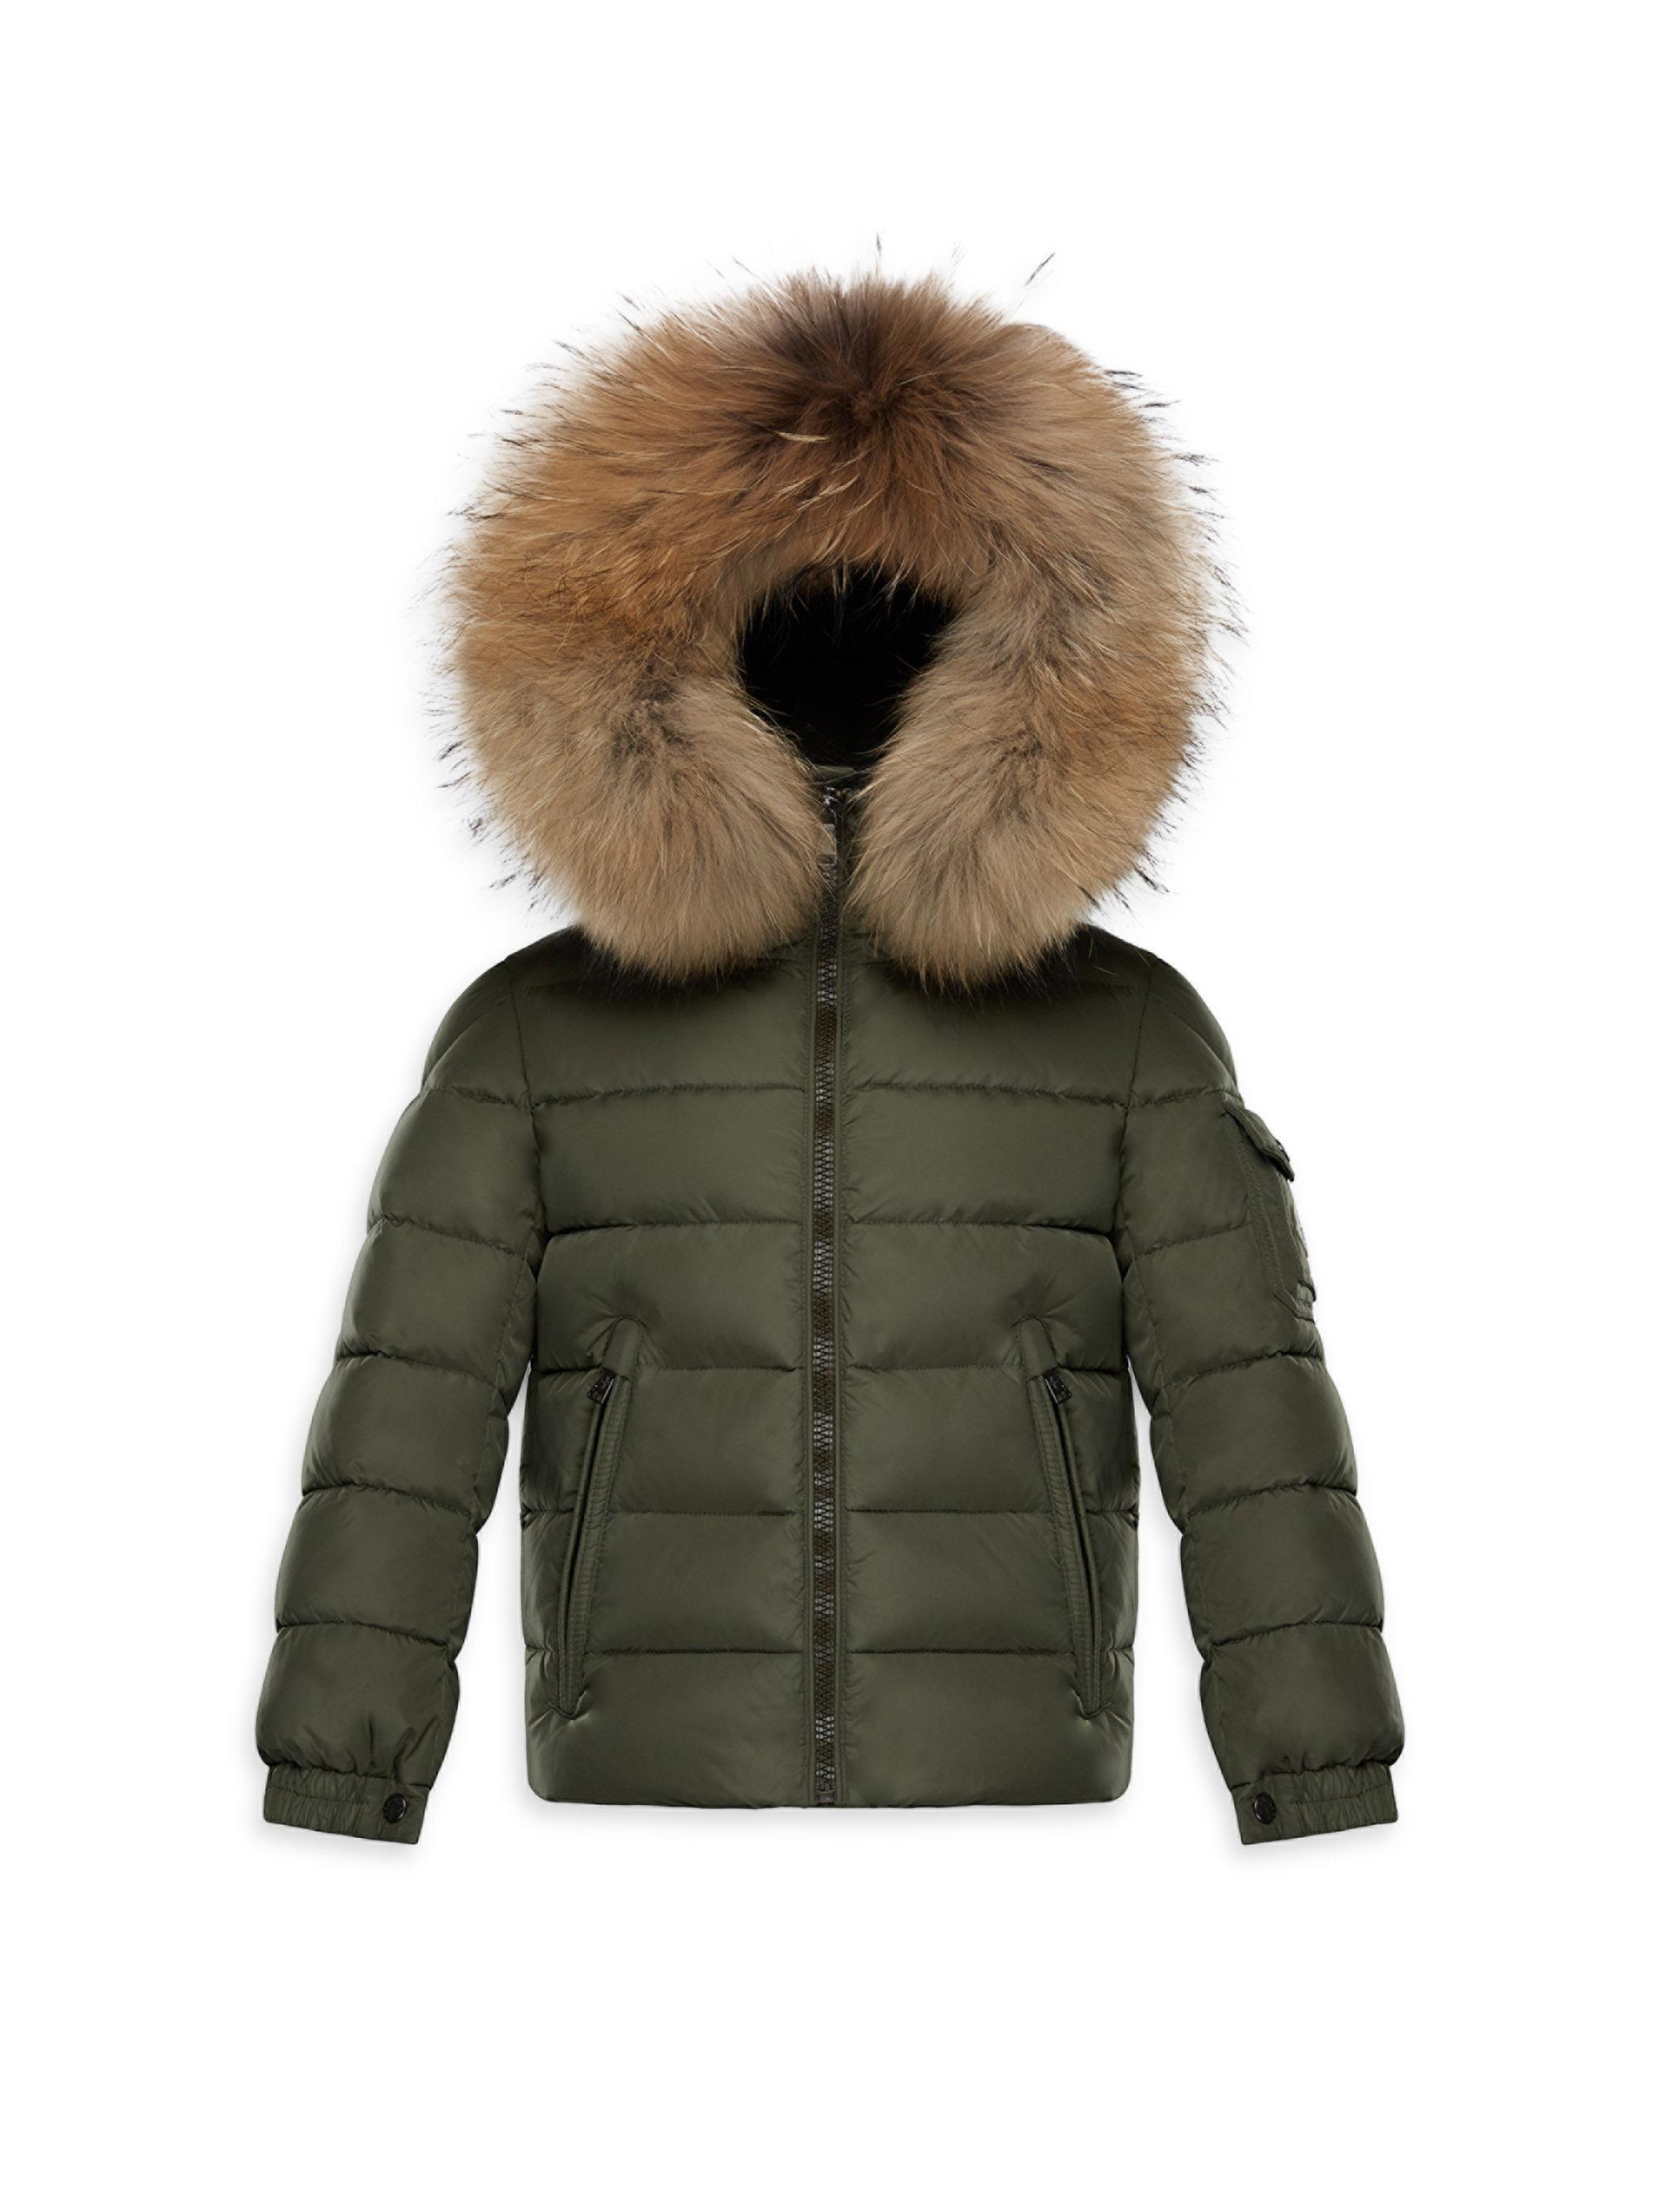 07500c2fb010 ebay moncler jacket nordstrom san francisco e73ed 97da3